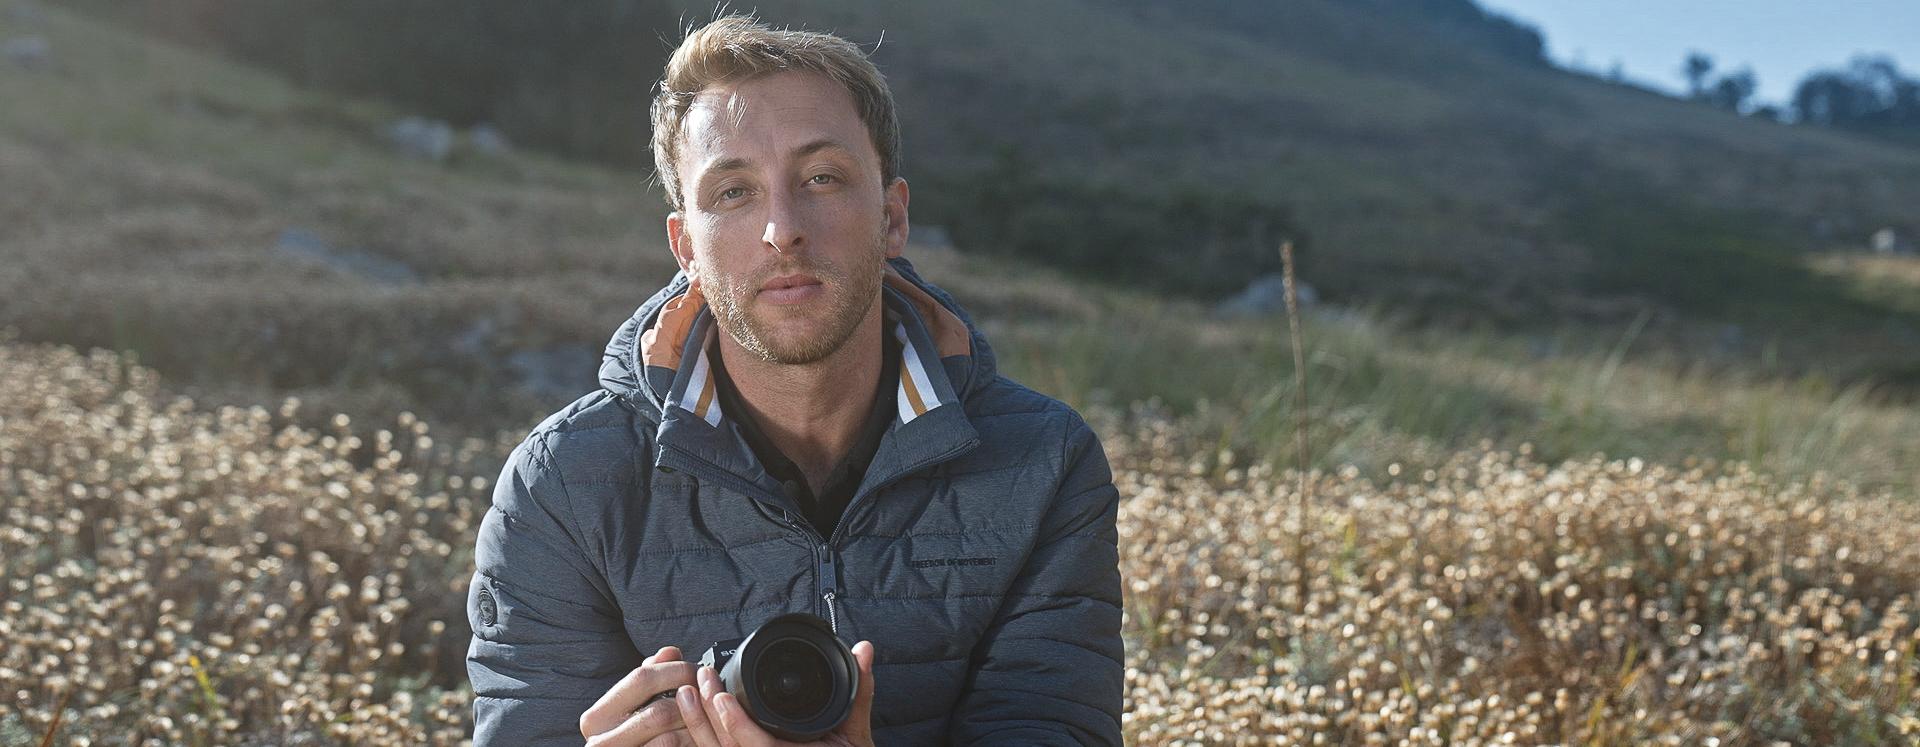 Wide angle Landscape Lens Choices